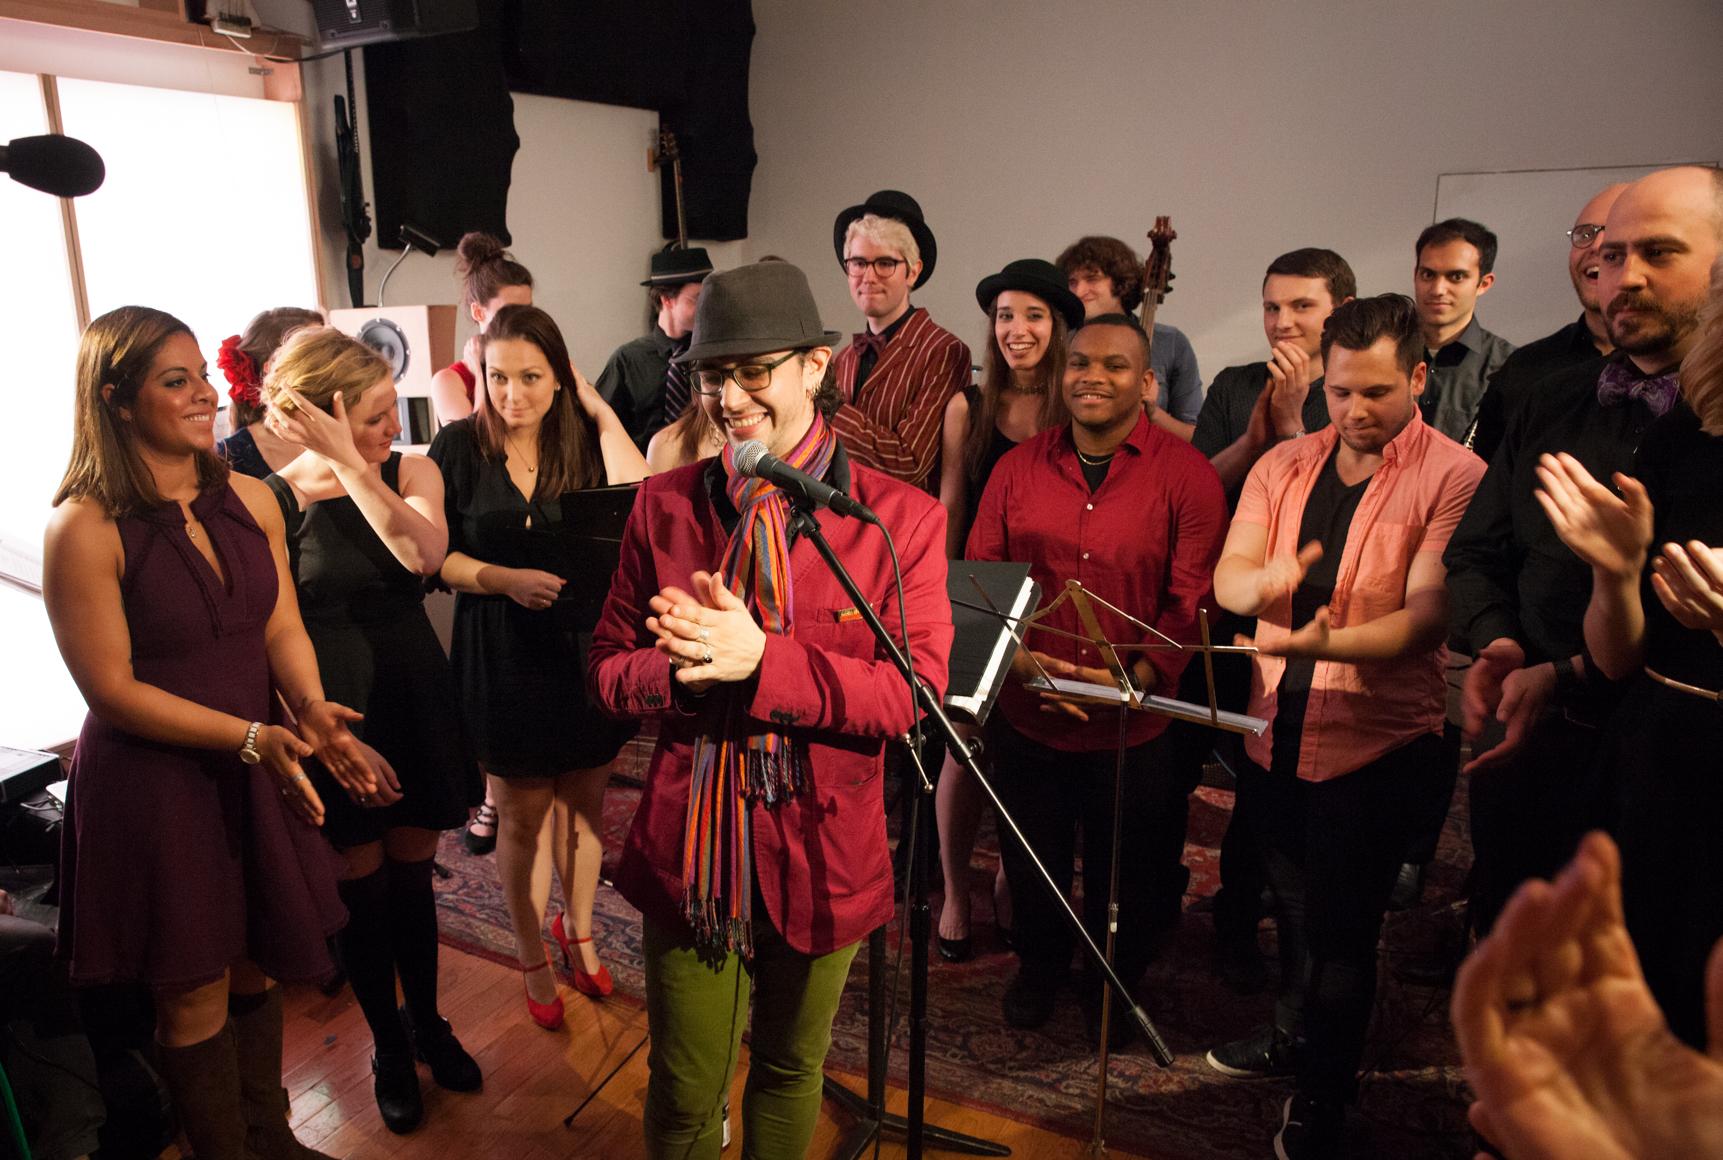 Christian De Gré at his residency concert at Spectrum New York-2015